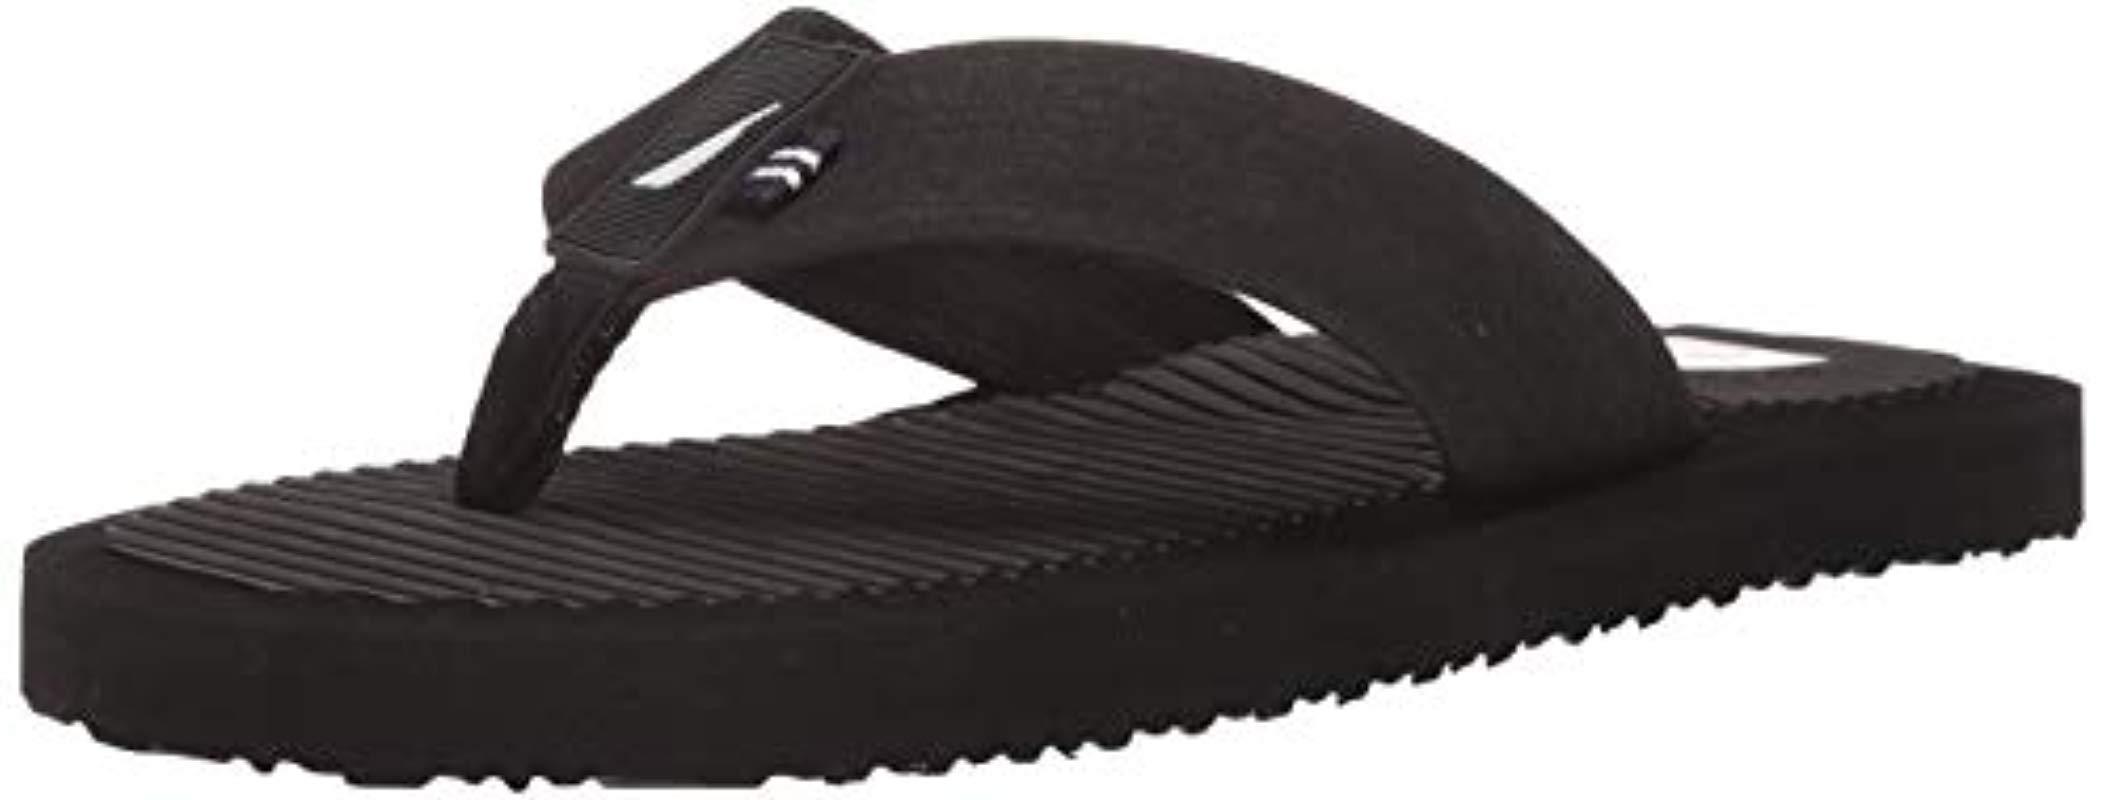 08911ee27d05 Lyst - Nautica Avast 2 Flip-flop in Black for Men